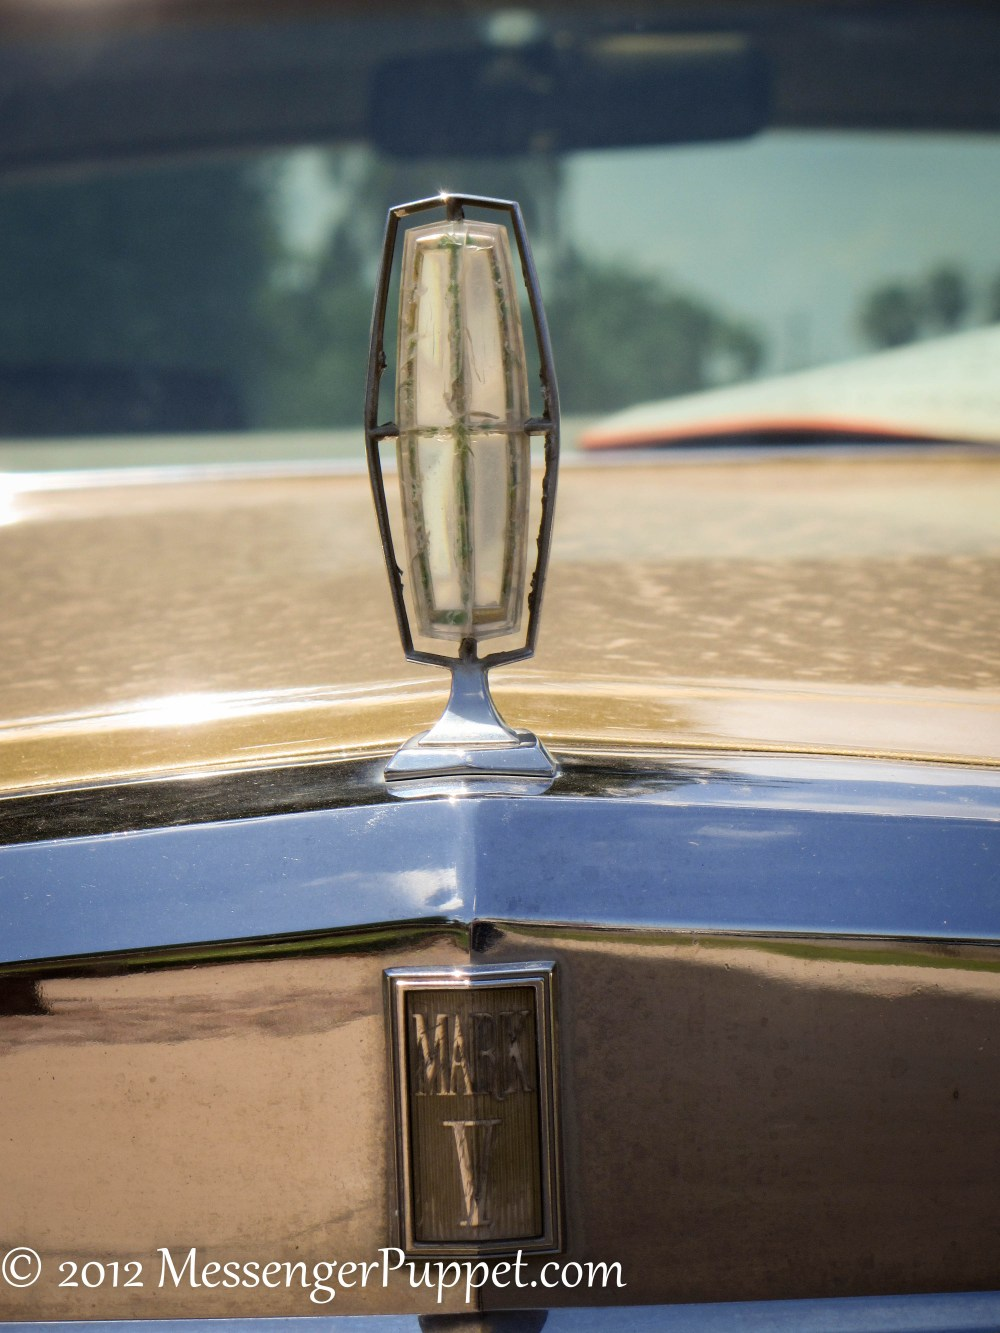 1978 Lincoln Continental Mark V Diamond Jubiliee edition